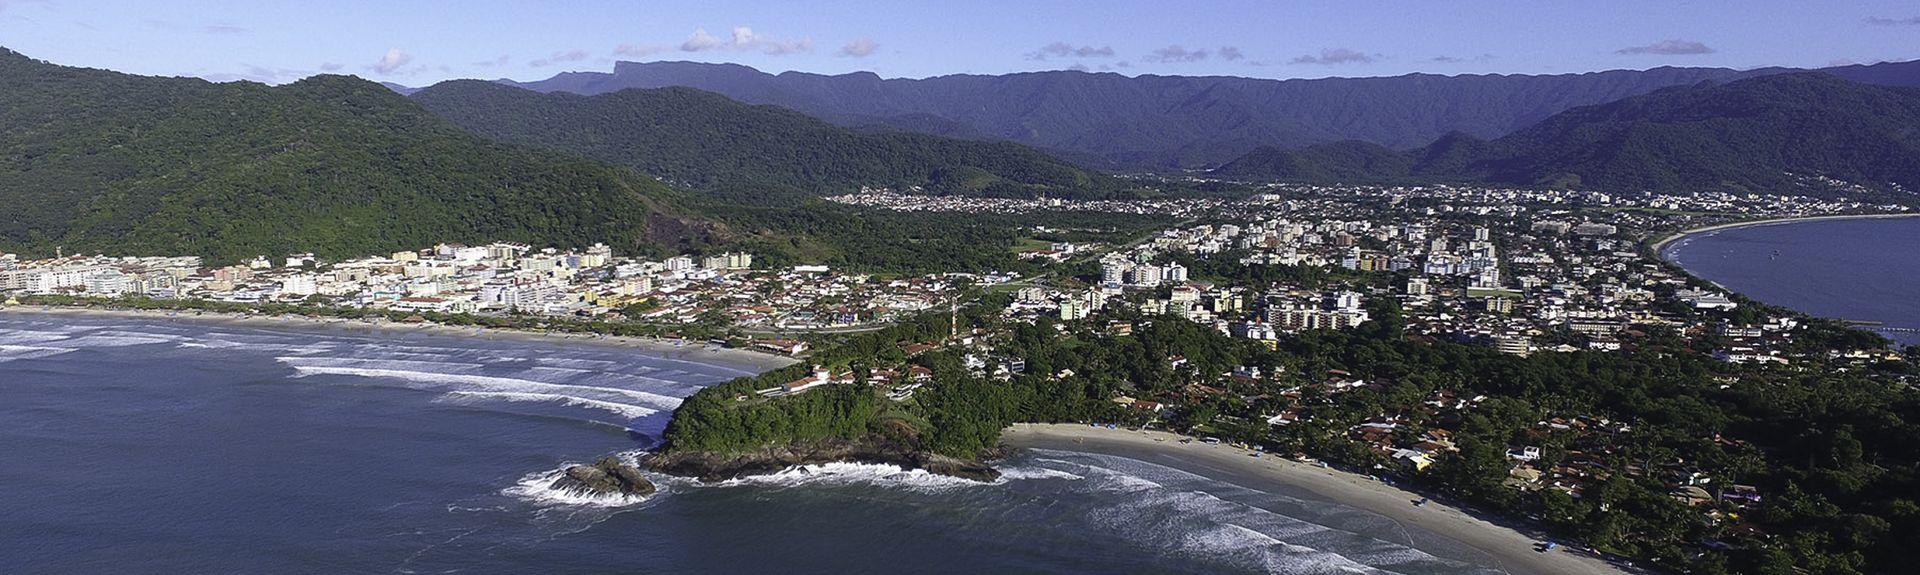 Praia Grande, Ubatuba, São Paulo (estado), Região Sudeste, Brasil